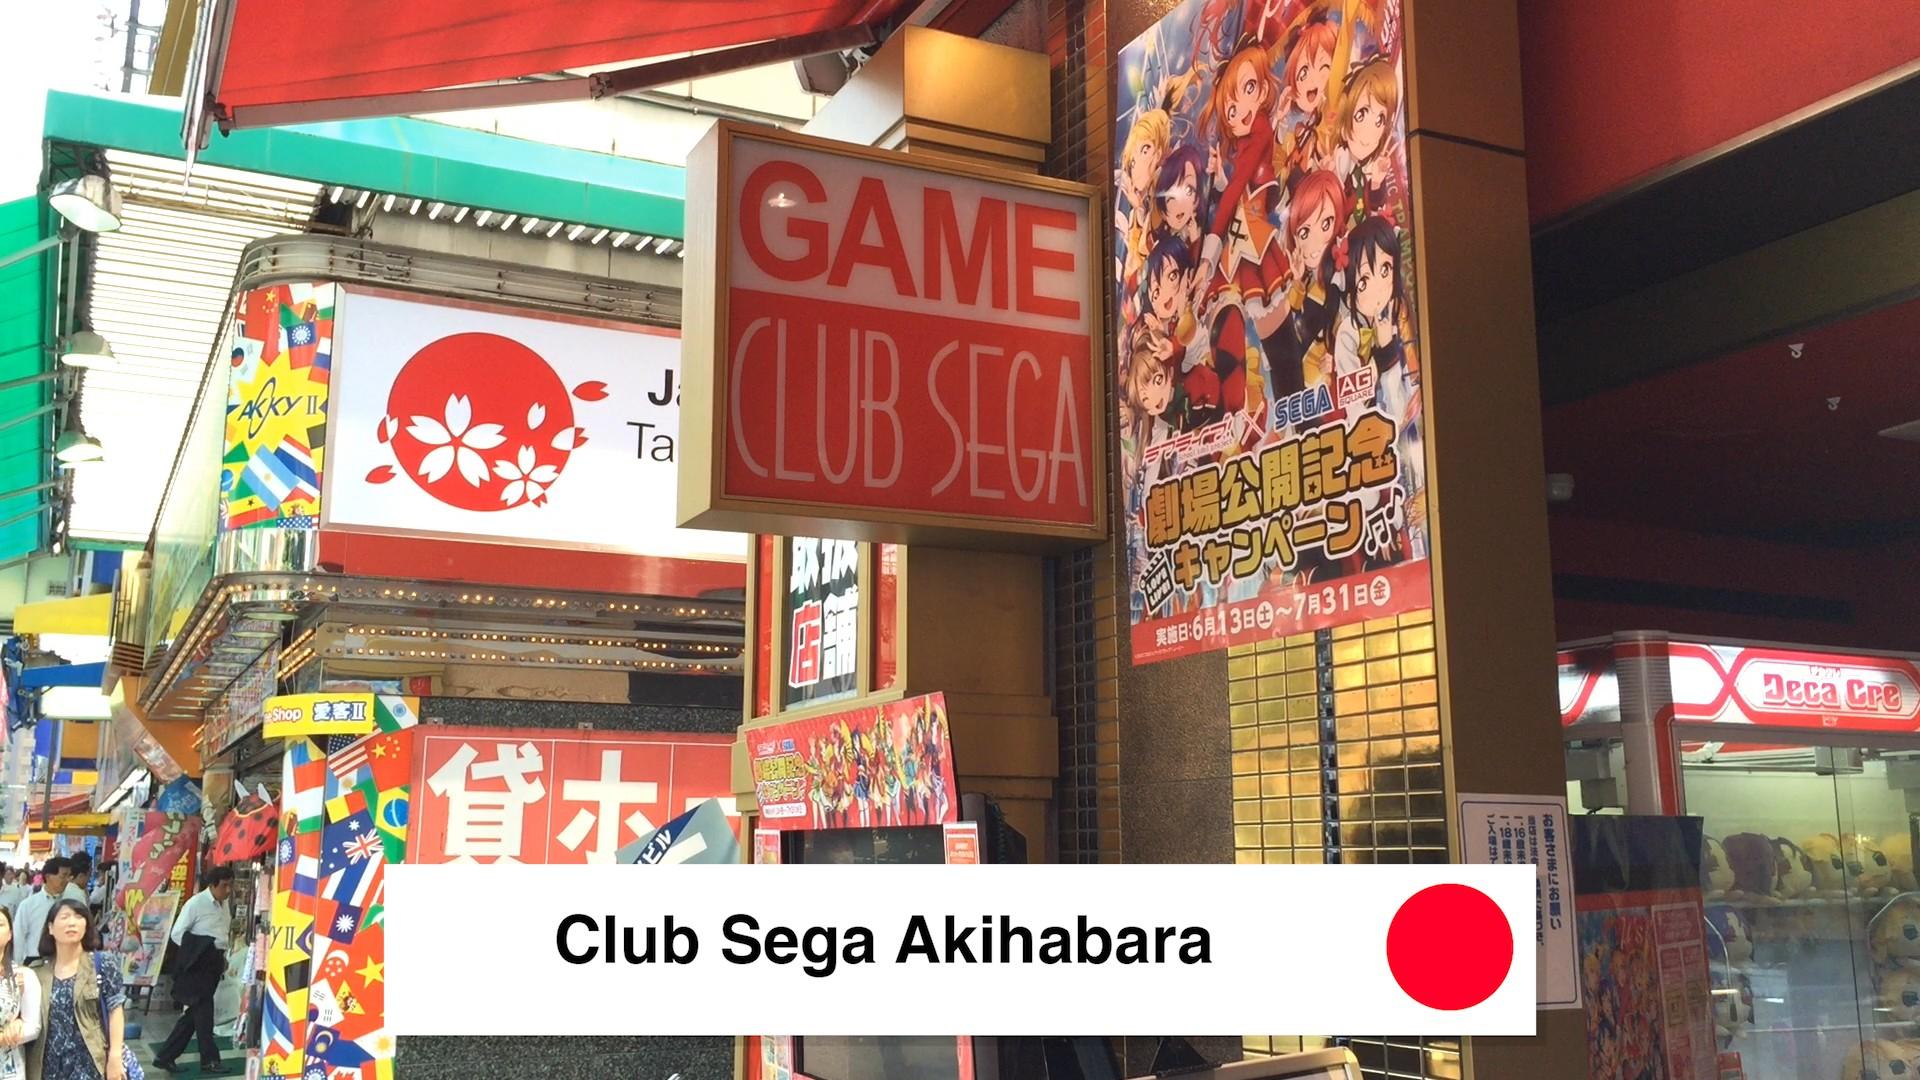 Club Sega Akihabara Tokyo - Walking Around Akihabara Tokyo What To Do 2018 - Loot Anime Discount Code 2018 🇯🇵 🏙 📦